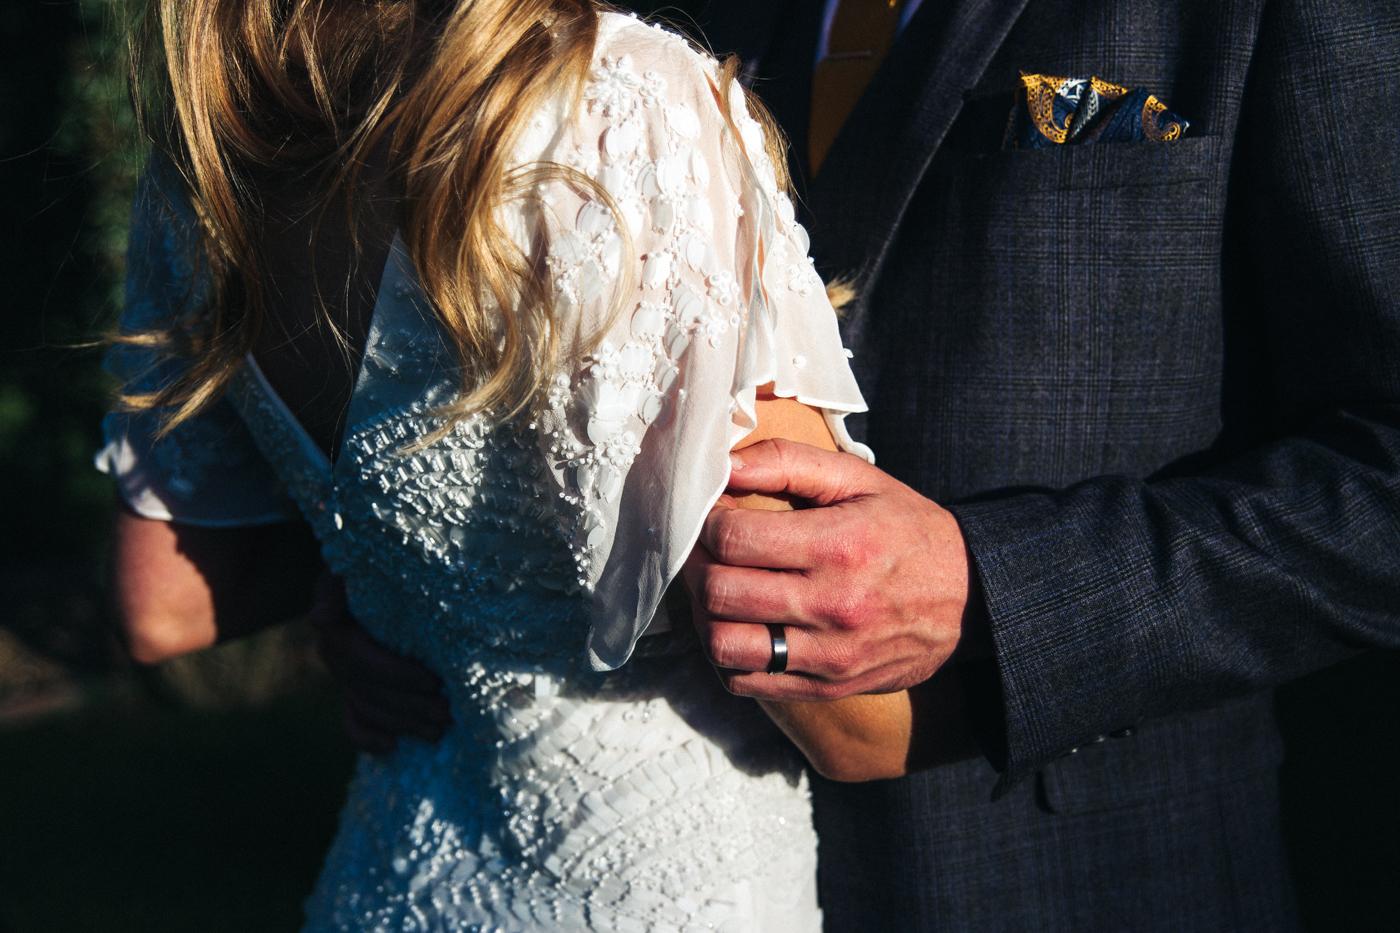 teesside-middlesbrough-north-east-wedding-photographer-creative-wedding-venues-0018.jpg